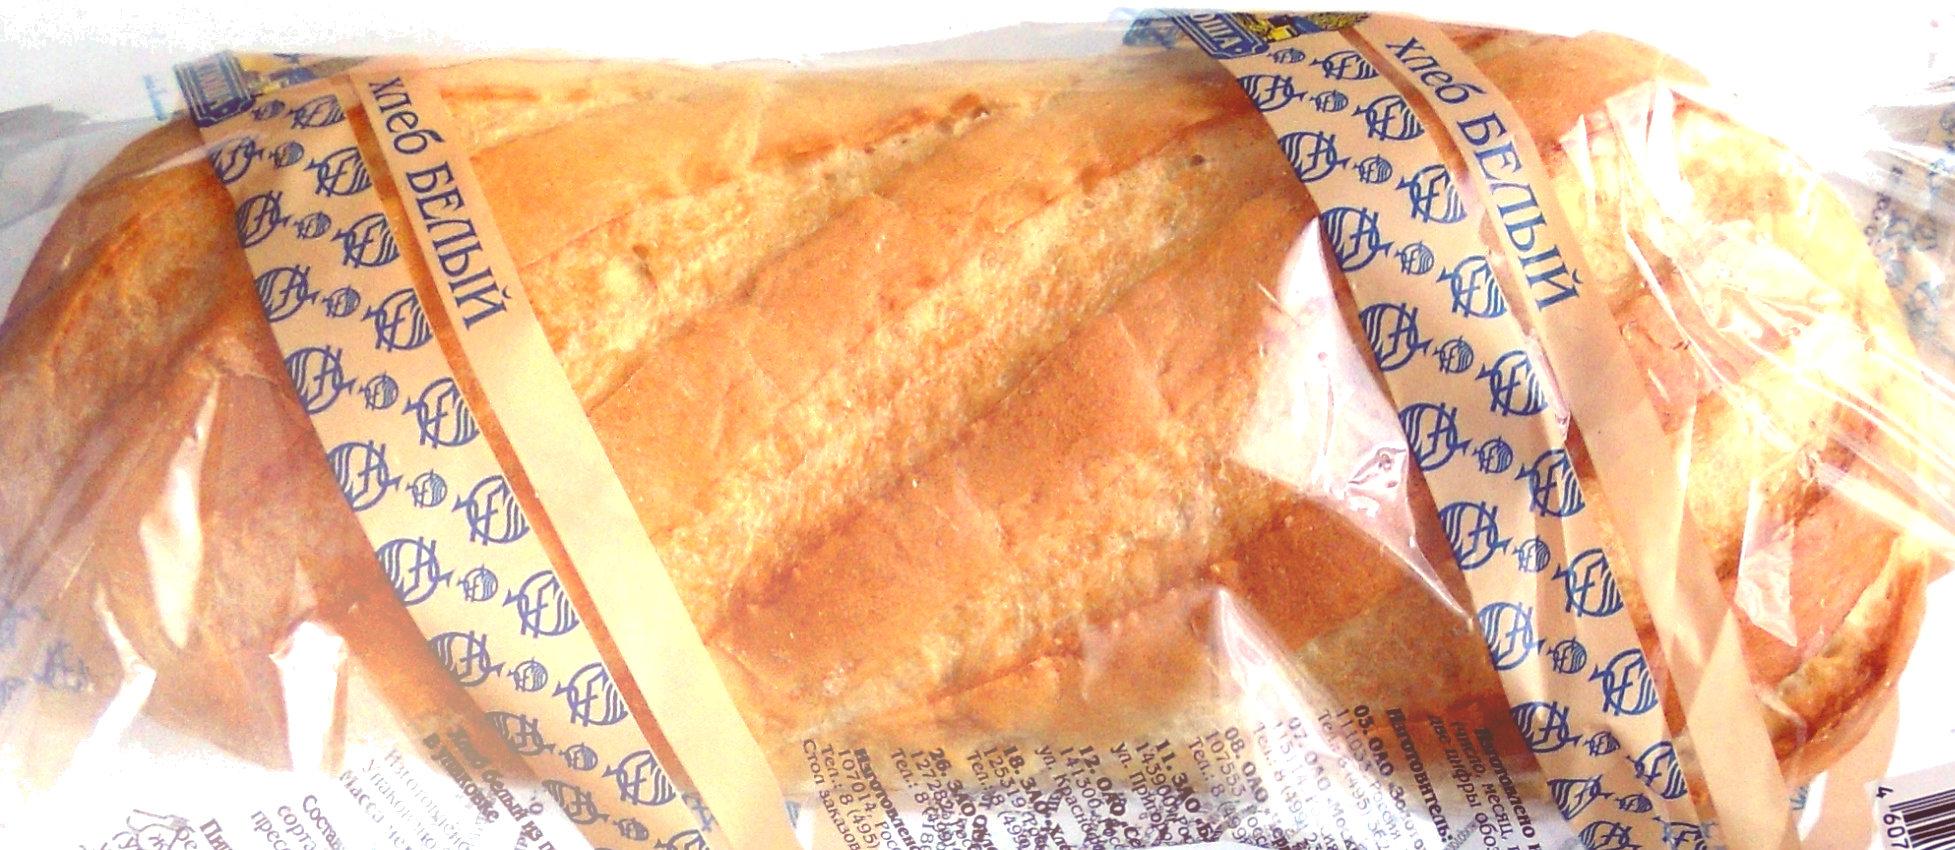 Хлеб белый - Product